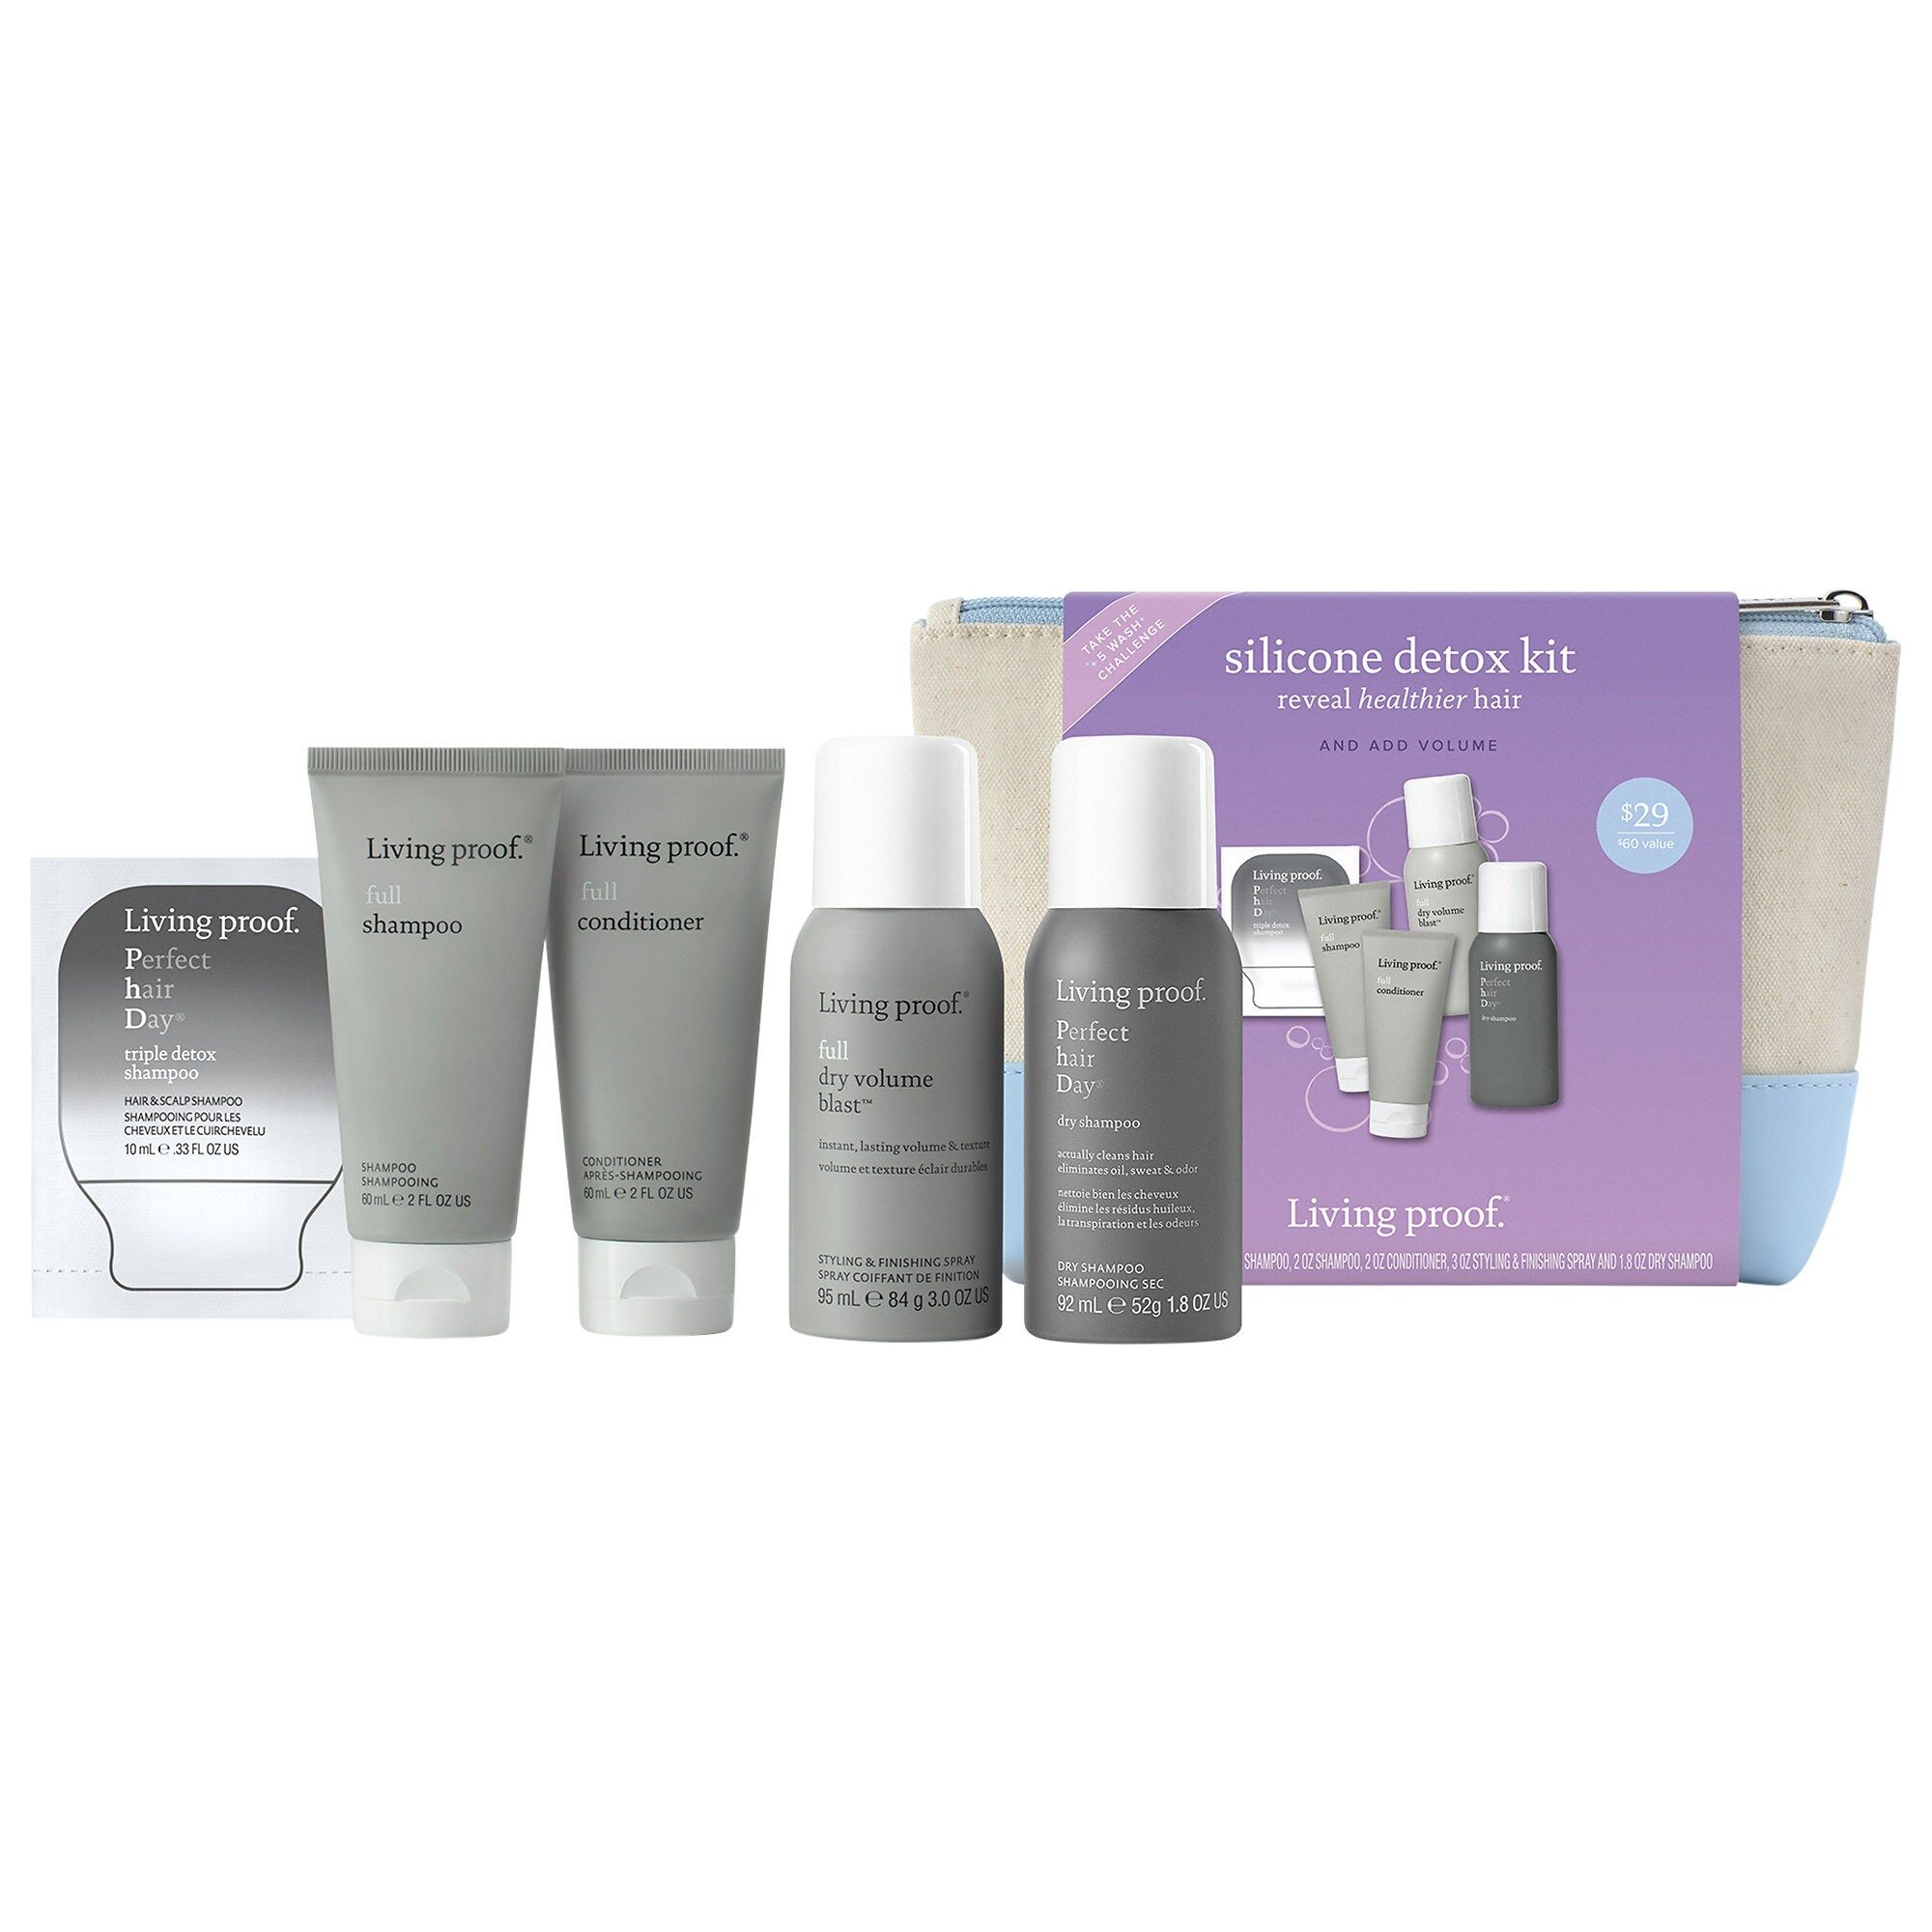 Living Proof Full Silicone Detox Kit Detox Kit Perfect Hair Shampoo Living Proof